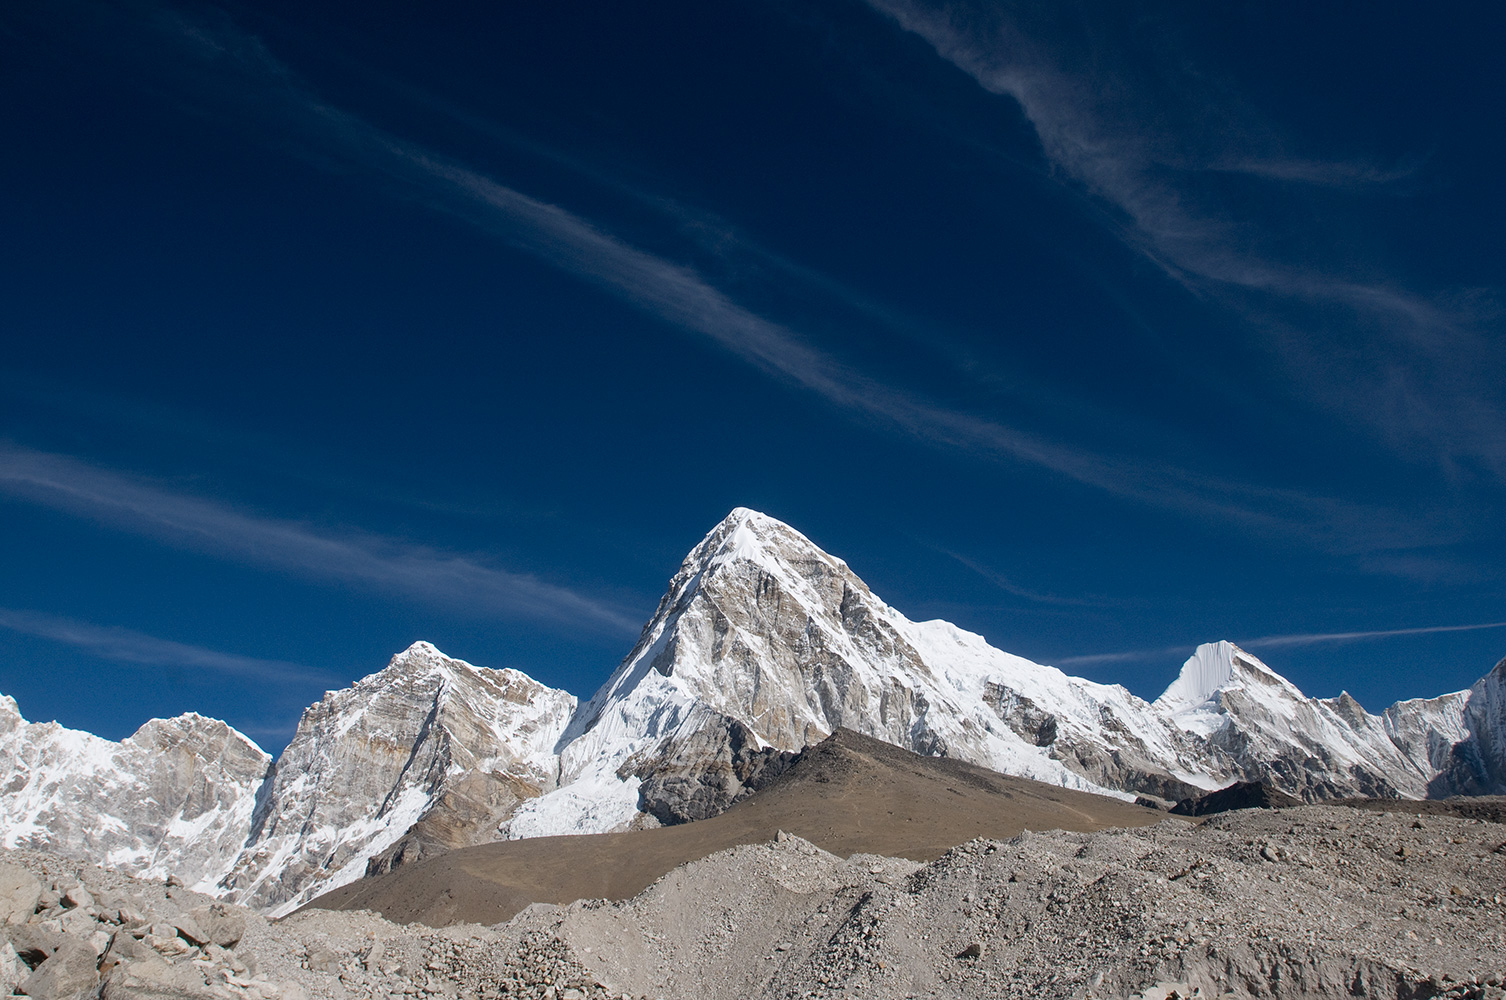 From the Changri Shar glacier below Gorak Shep. Kala Pattar clearly visible immediately below the main peak.Nikon D300, 17-35mm. November 2008